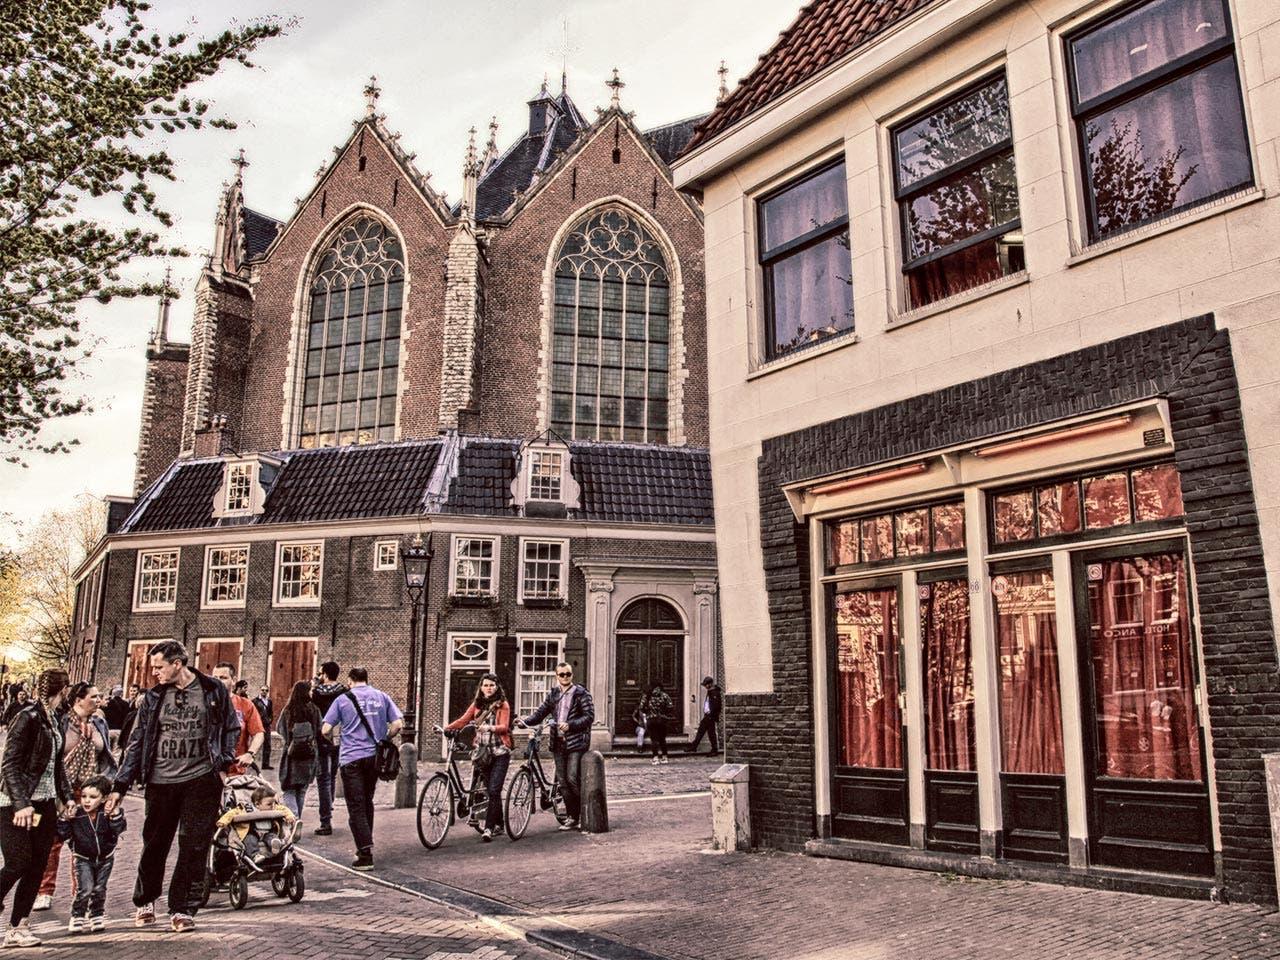 Netherlands | InnaFelker/Shutterstock.com